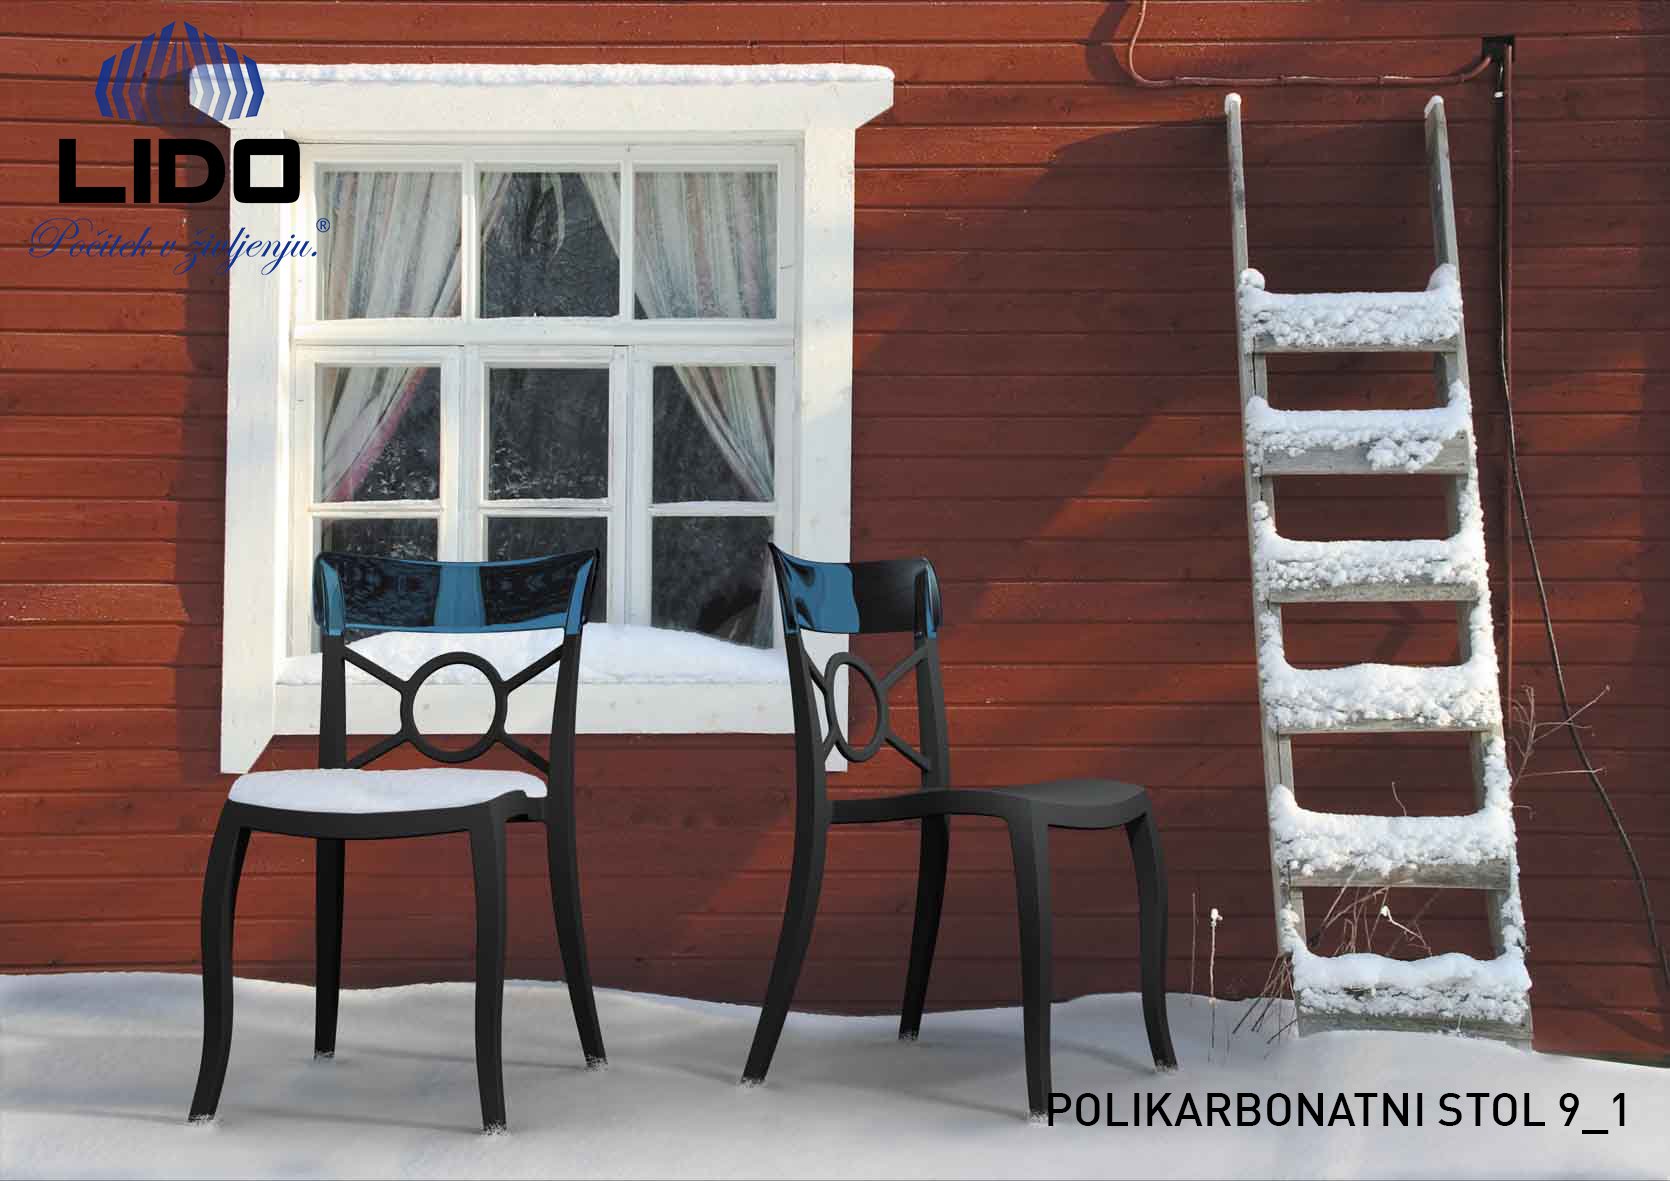 Lido_Polikarbonatni stol 9_1